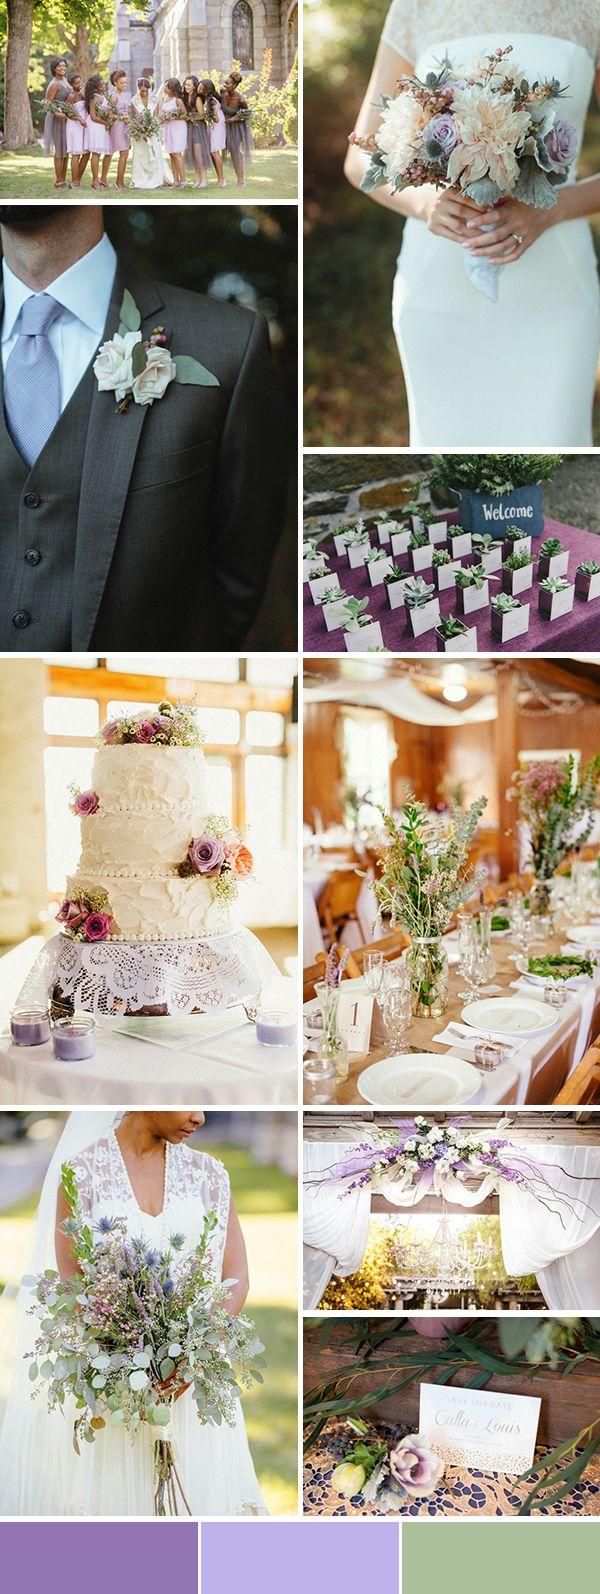 Wedding ideas spring   best Spring Wedding images on Pinterest  Bridal bouquets